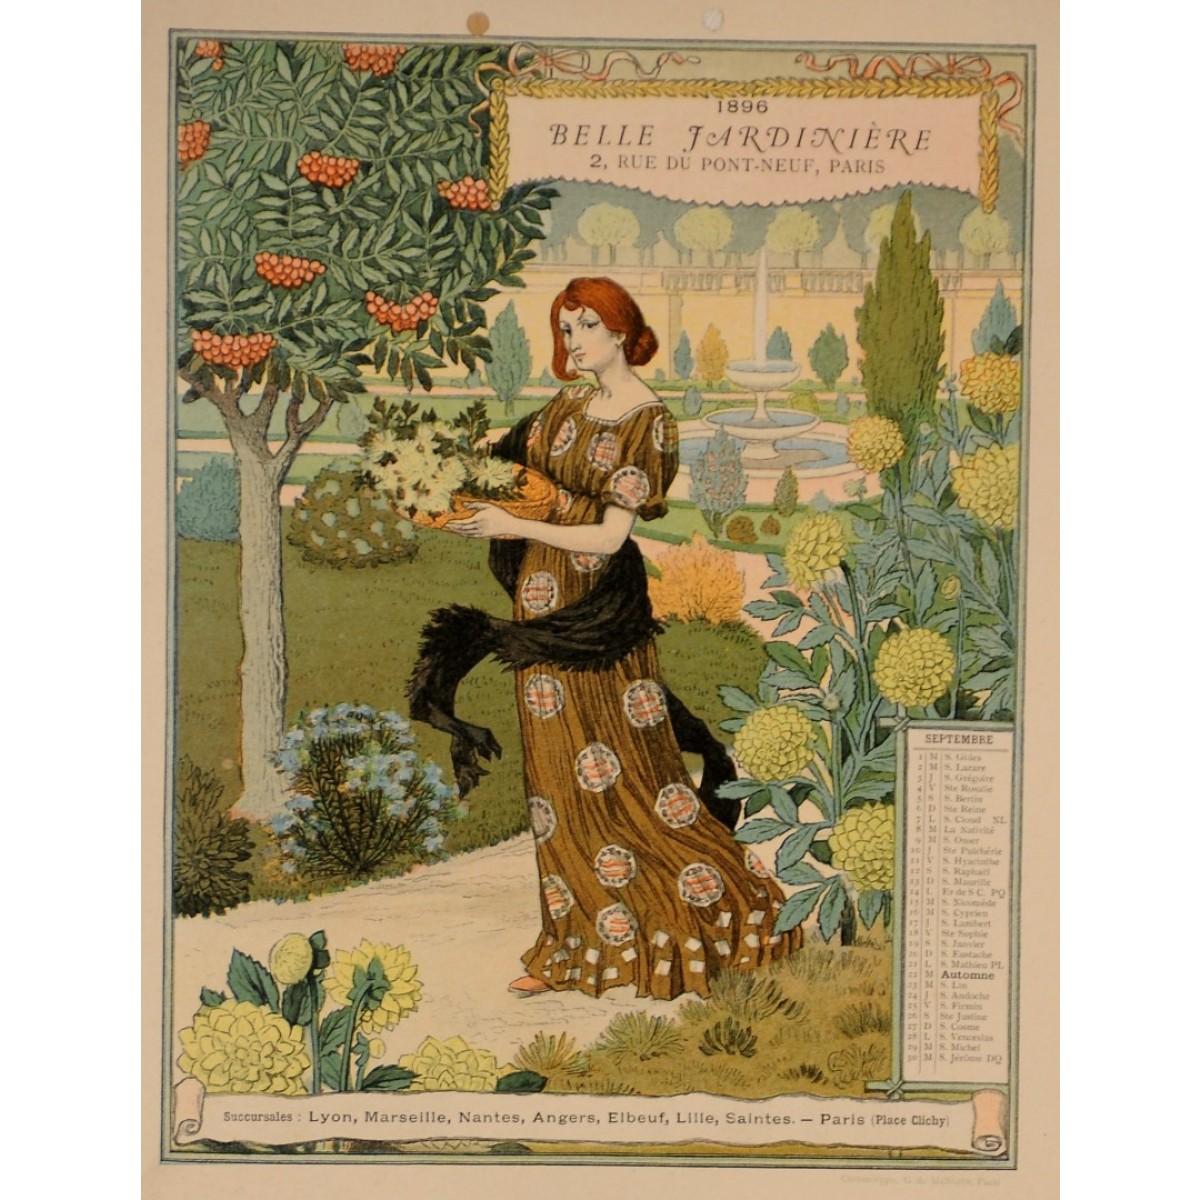 Color art nantes - A Set Of 12 Original Art Nouveau Color Lithograph By Eug Ne Grasset Malherbe 1896